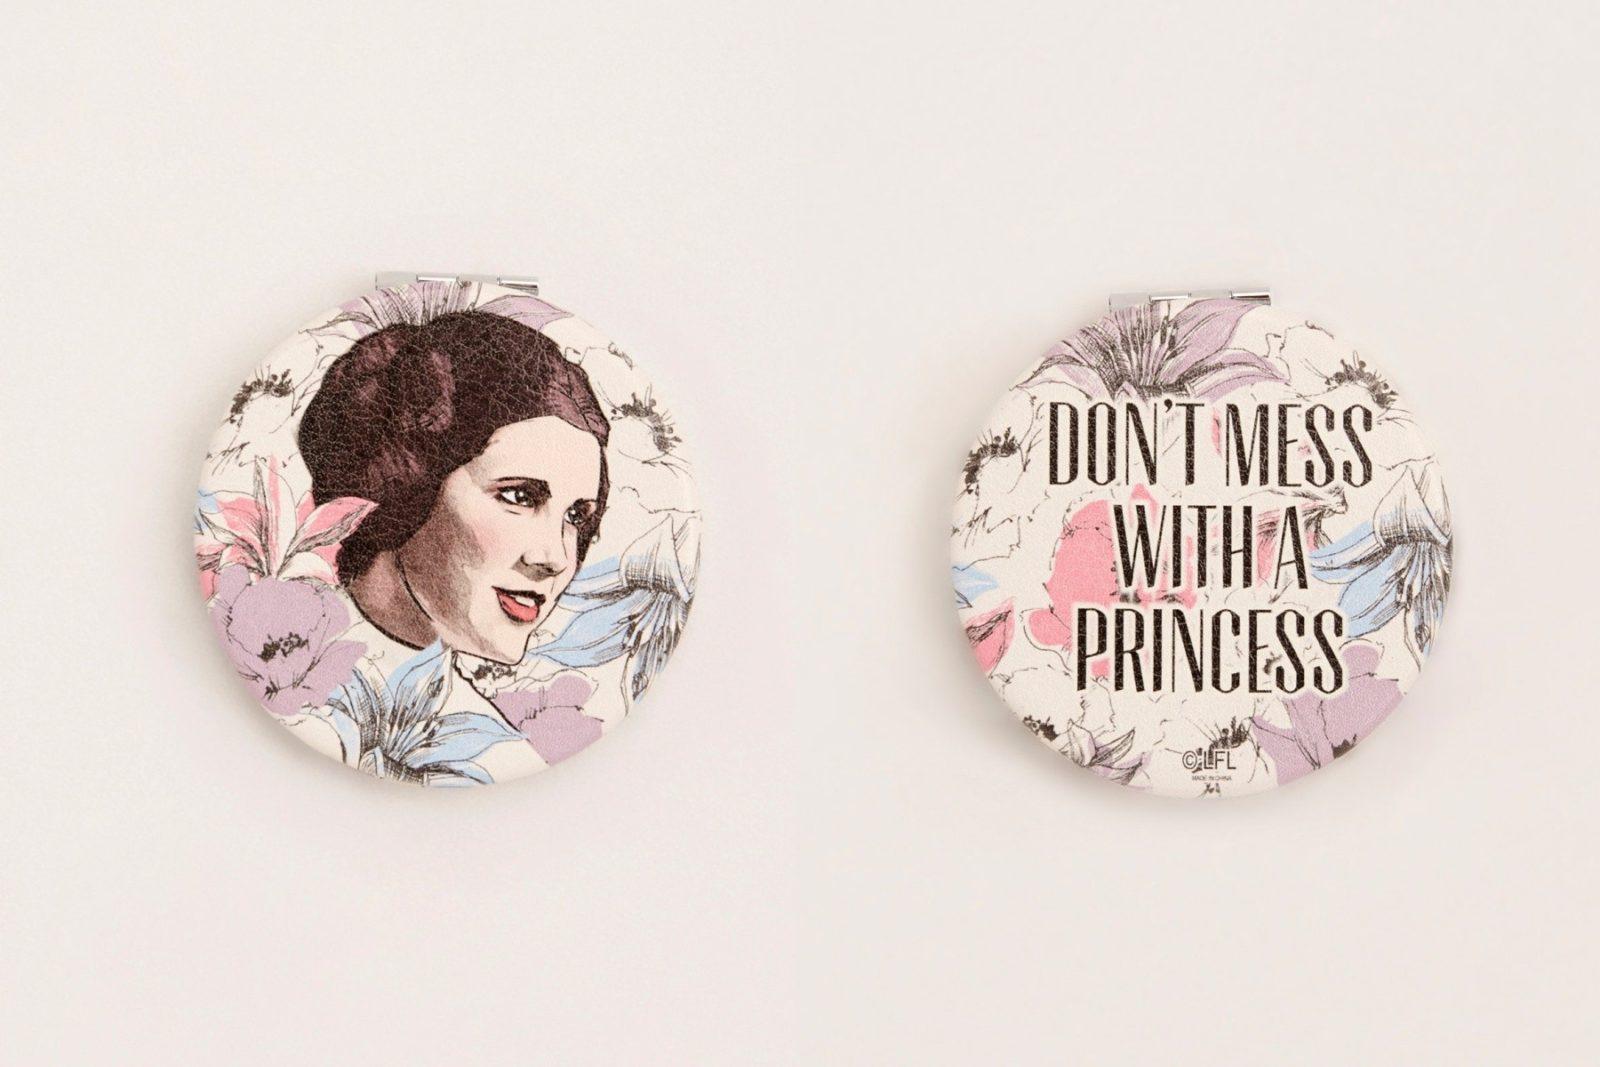 Princess Leia Compact Mirror at Torrid